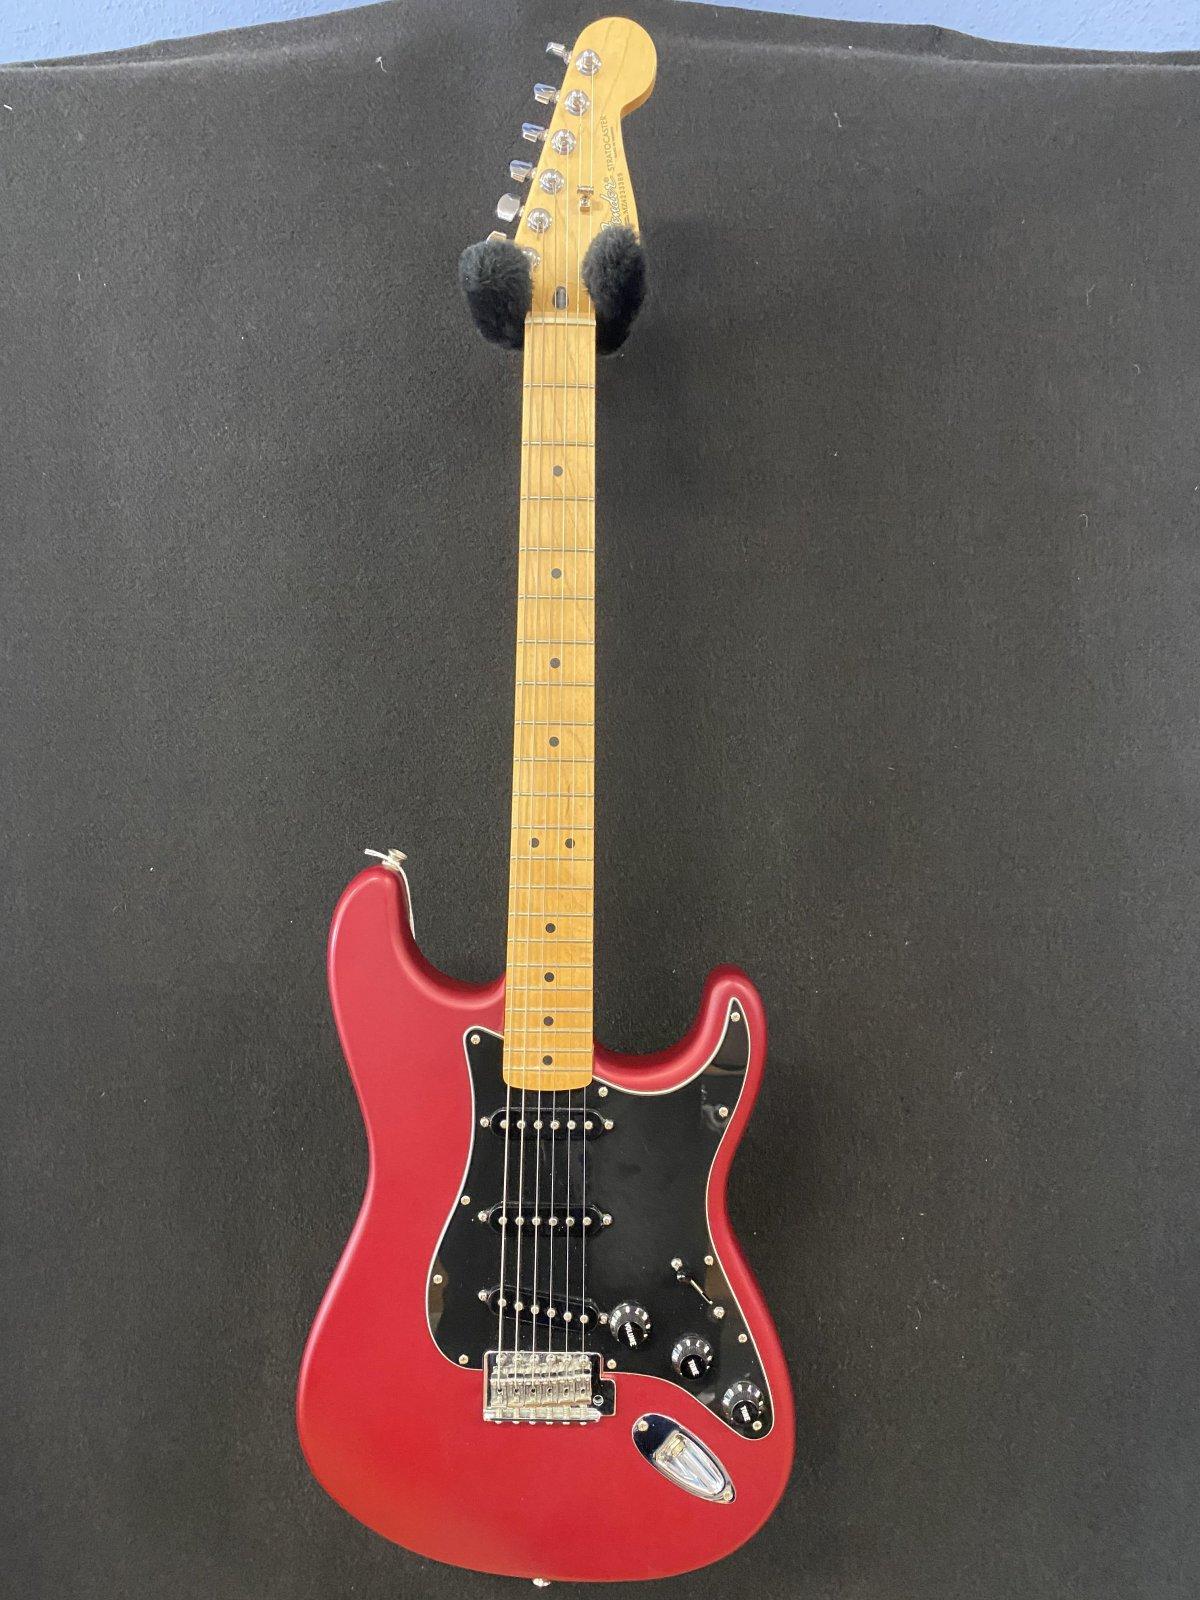 Fender Stratocaster MIM Red satin finish